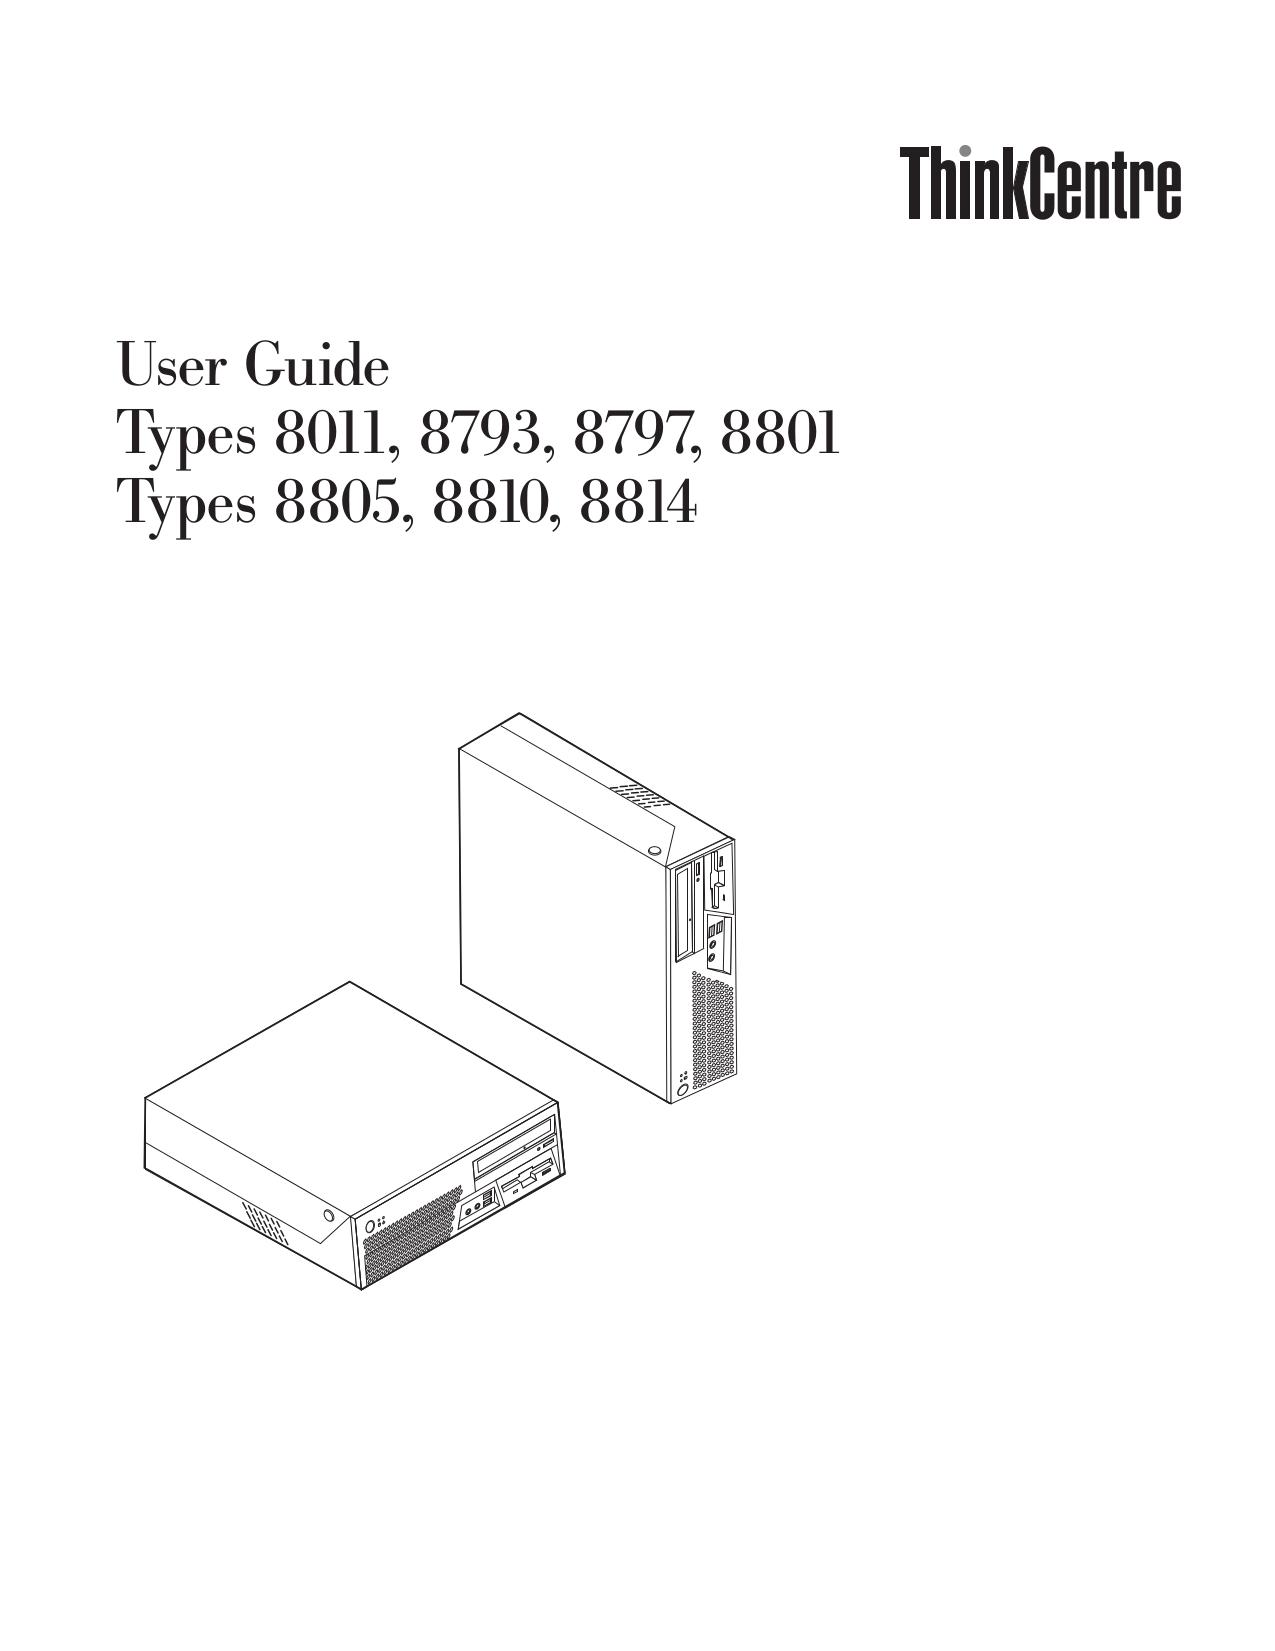 pdf for Lenovo Desktop ThinkCentre M55 8814 manual